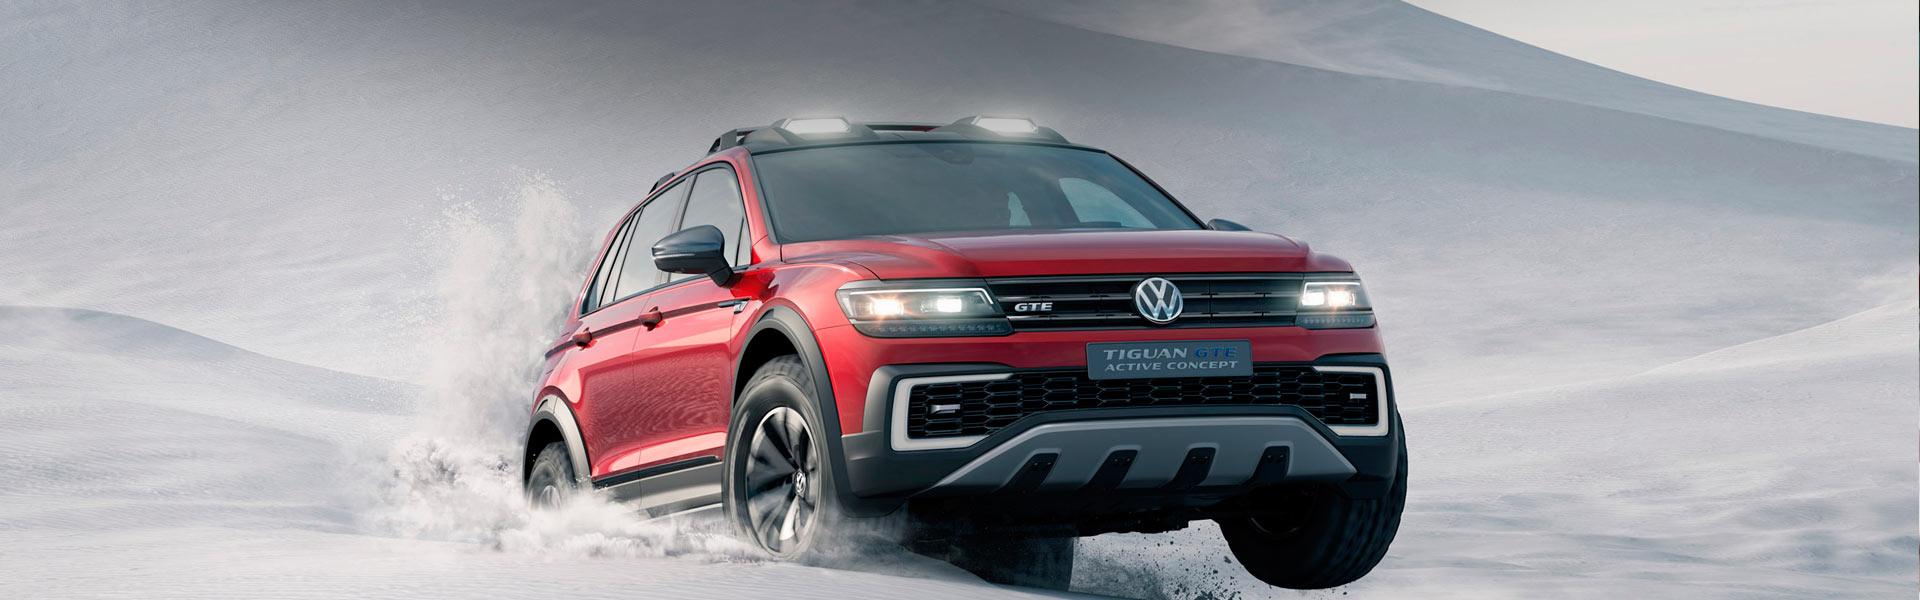 Запчасти на Volkswagen Tiguan